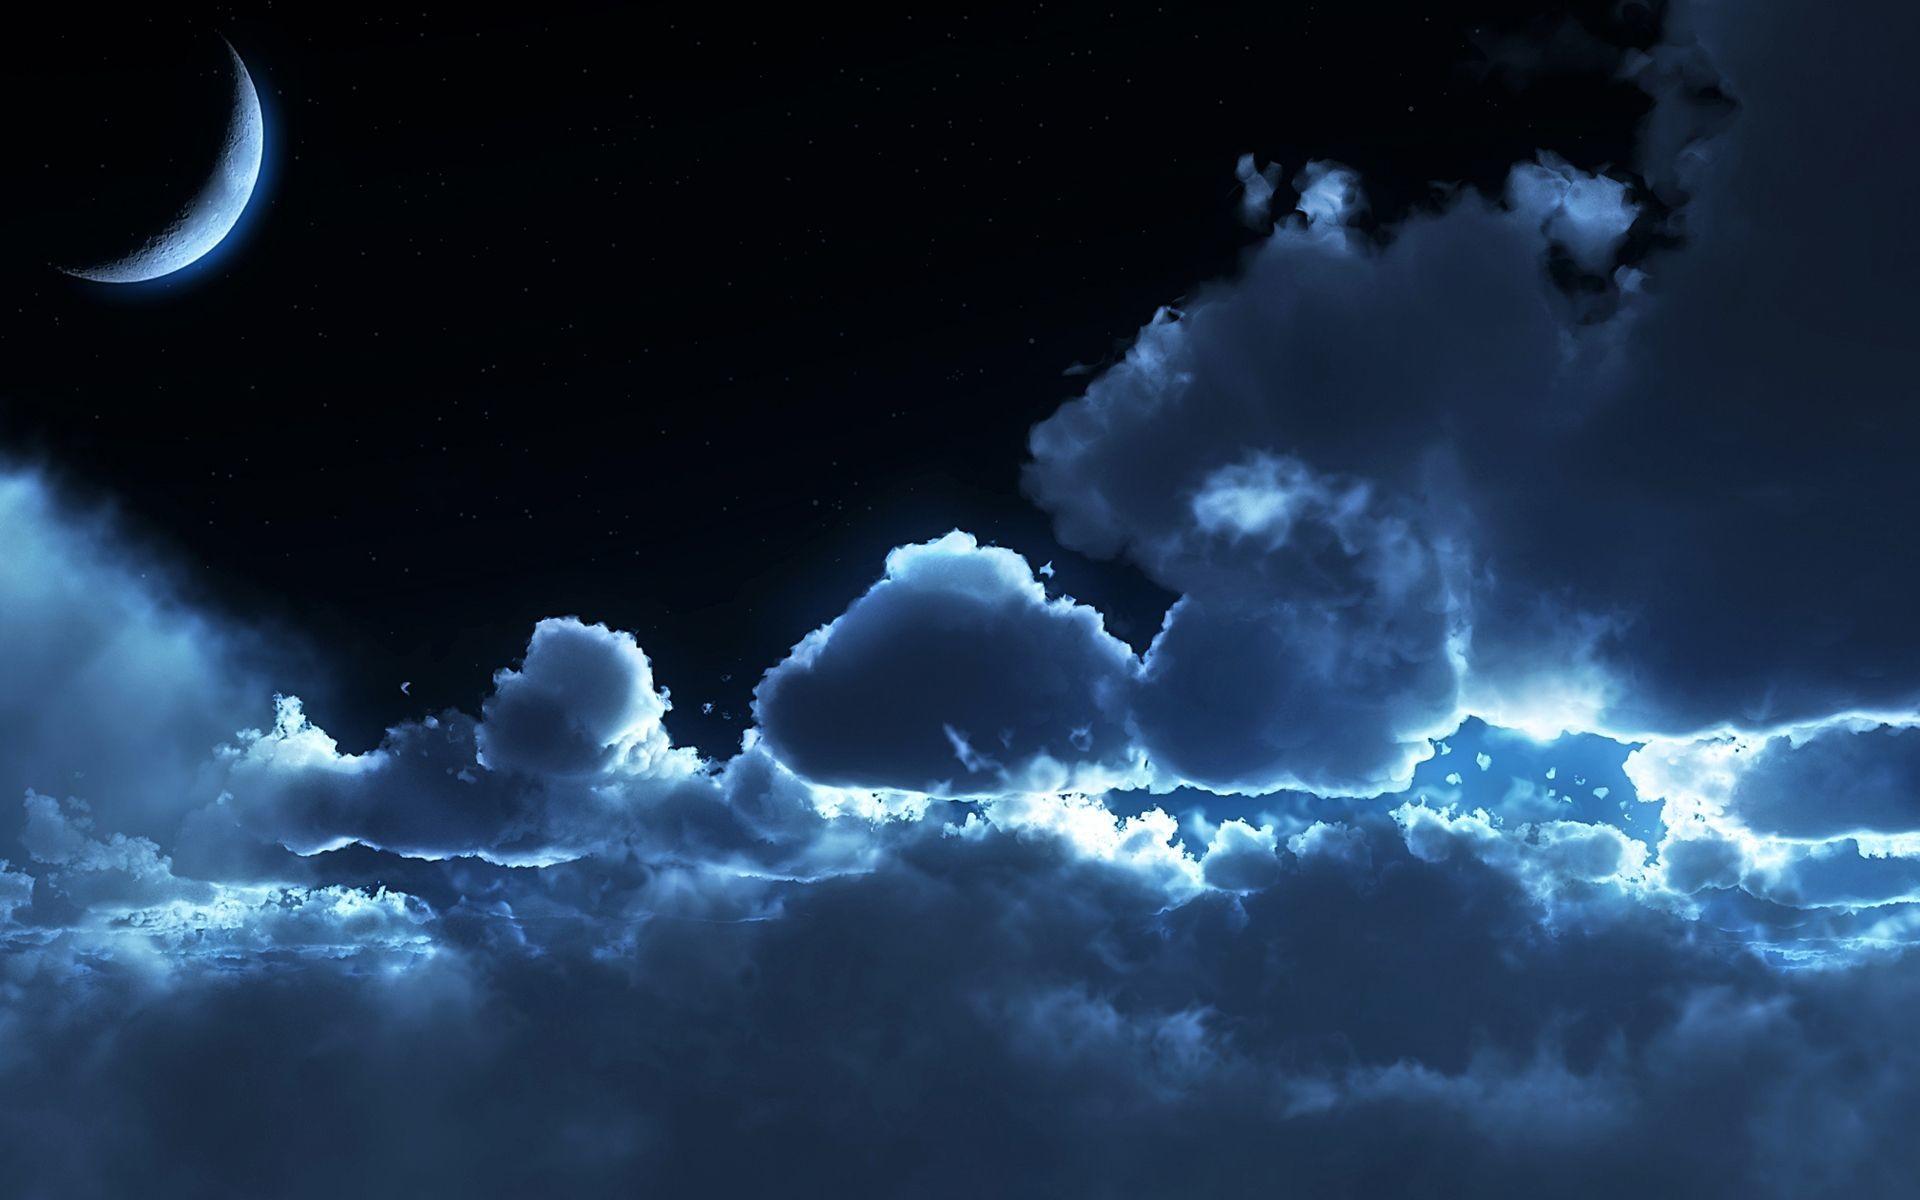 Clouds moon Night sky Starry HD Wallpaper